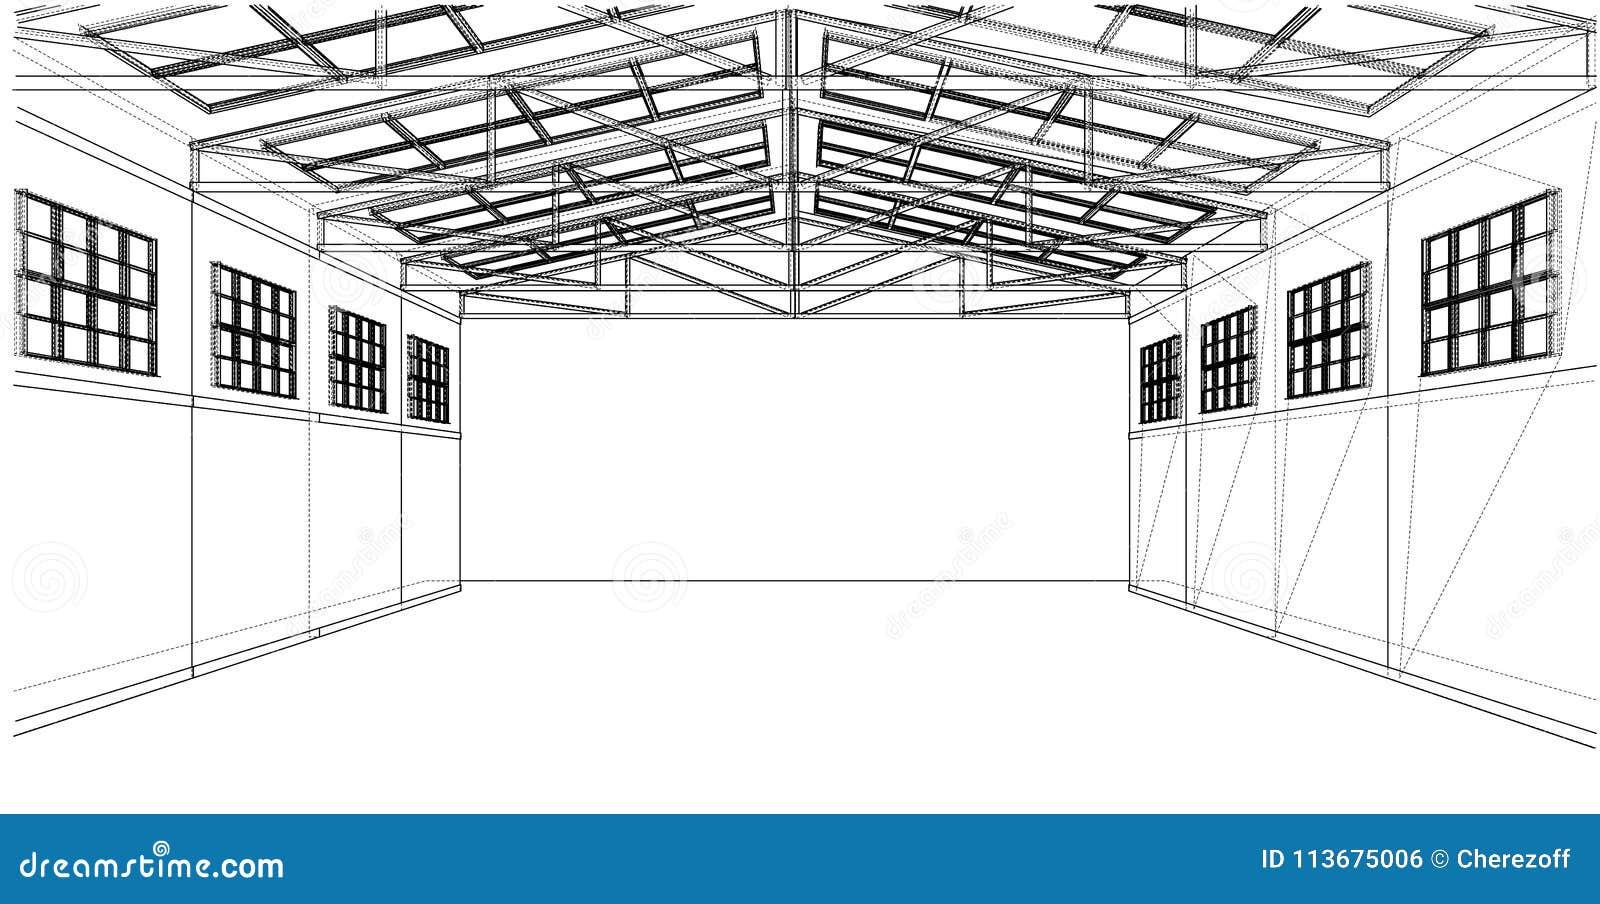 Warehouse sketch 3d illustration stock illustration illustration download warehouse sketch 3d illustration stock illustration illustration of hall design 113675006 malvernweather Choice Image